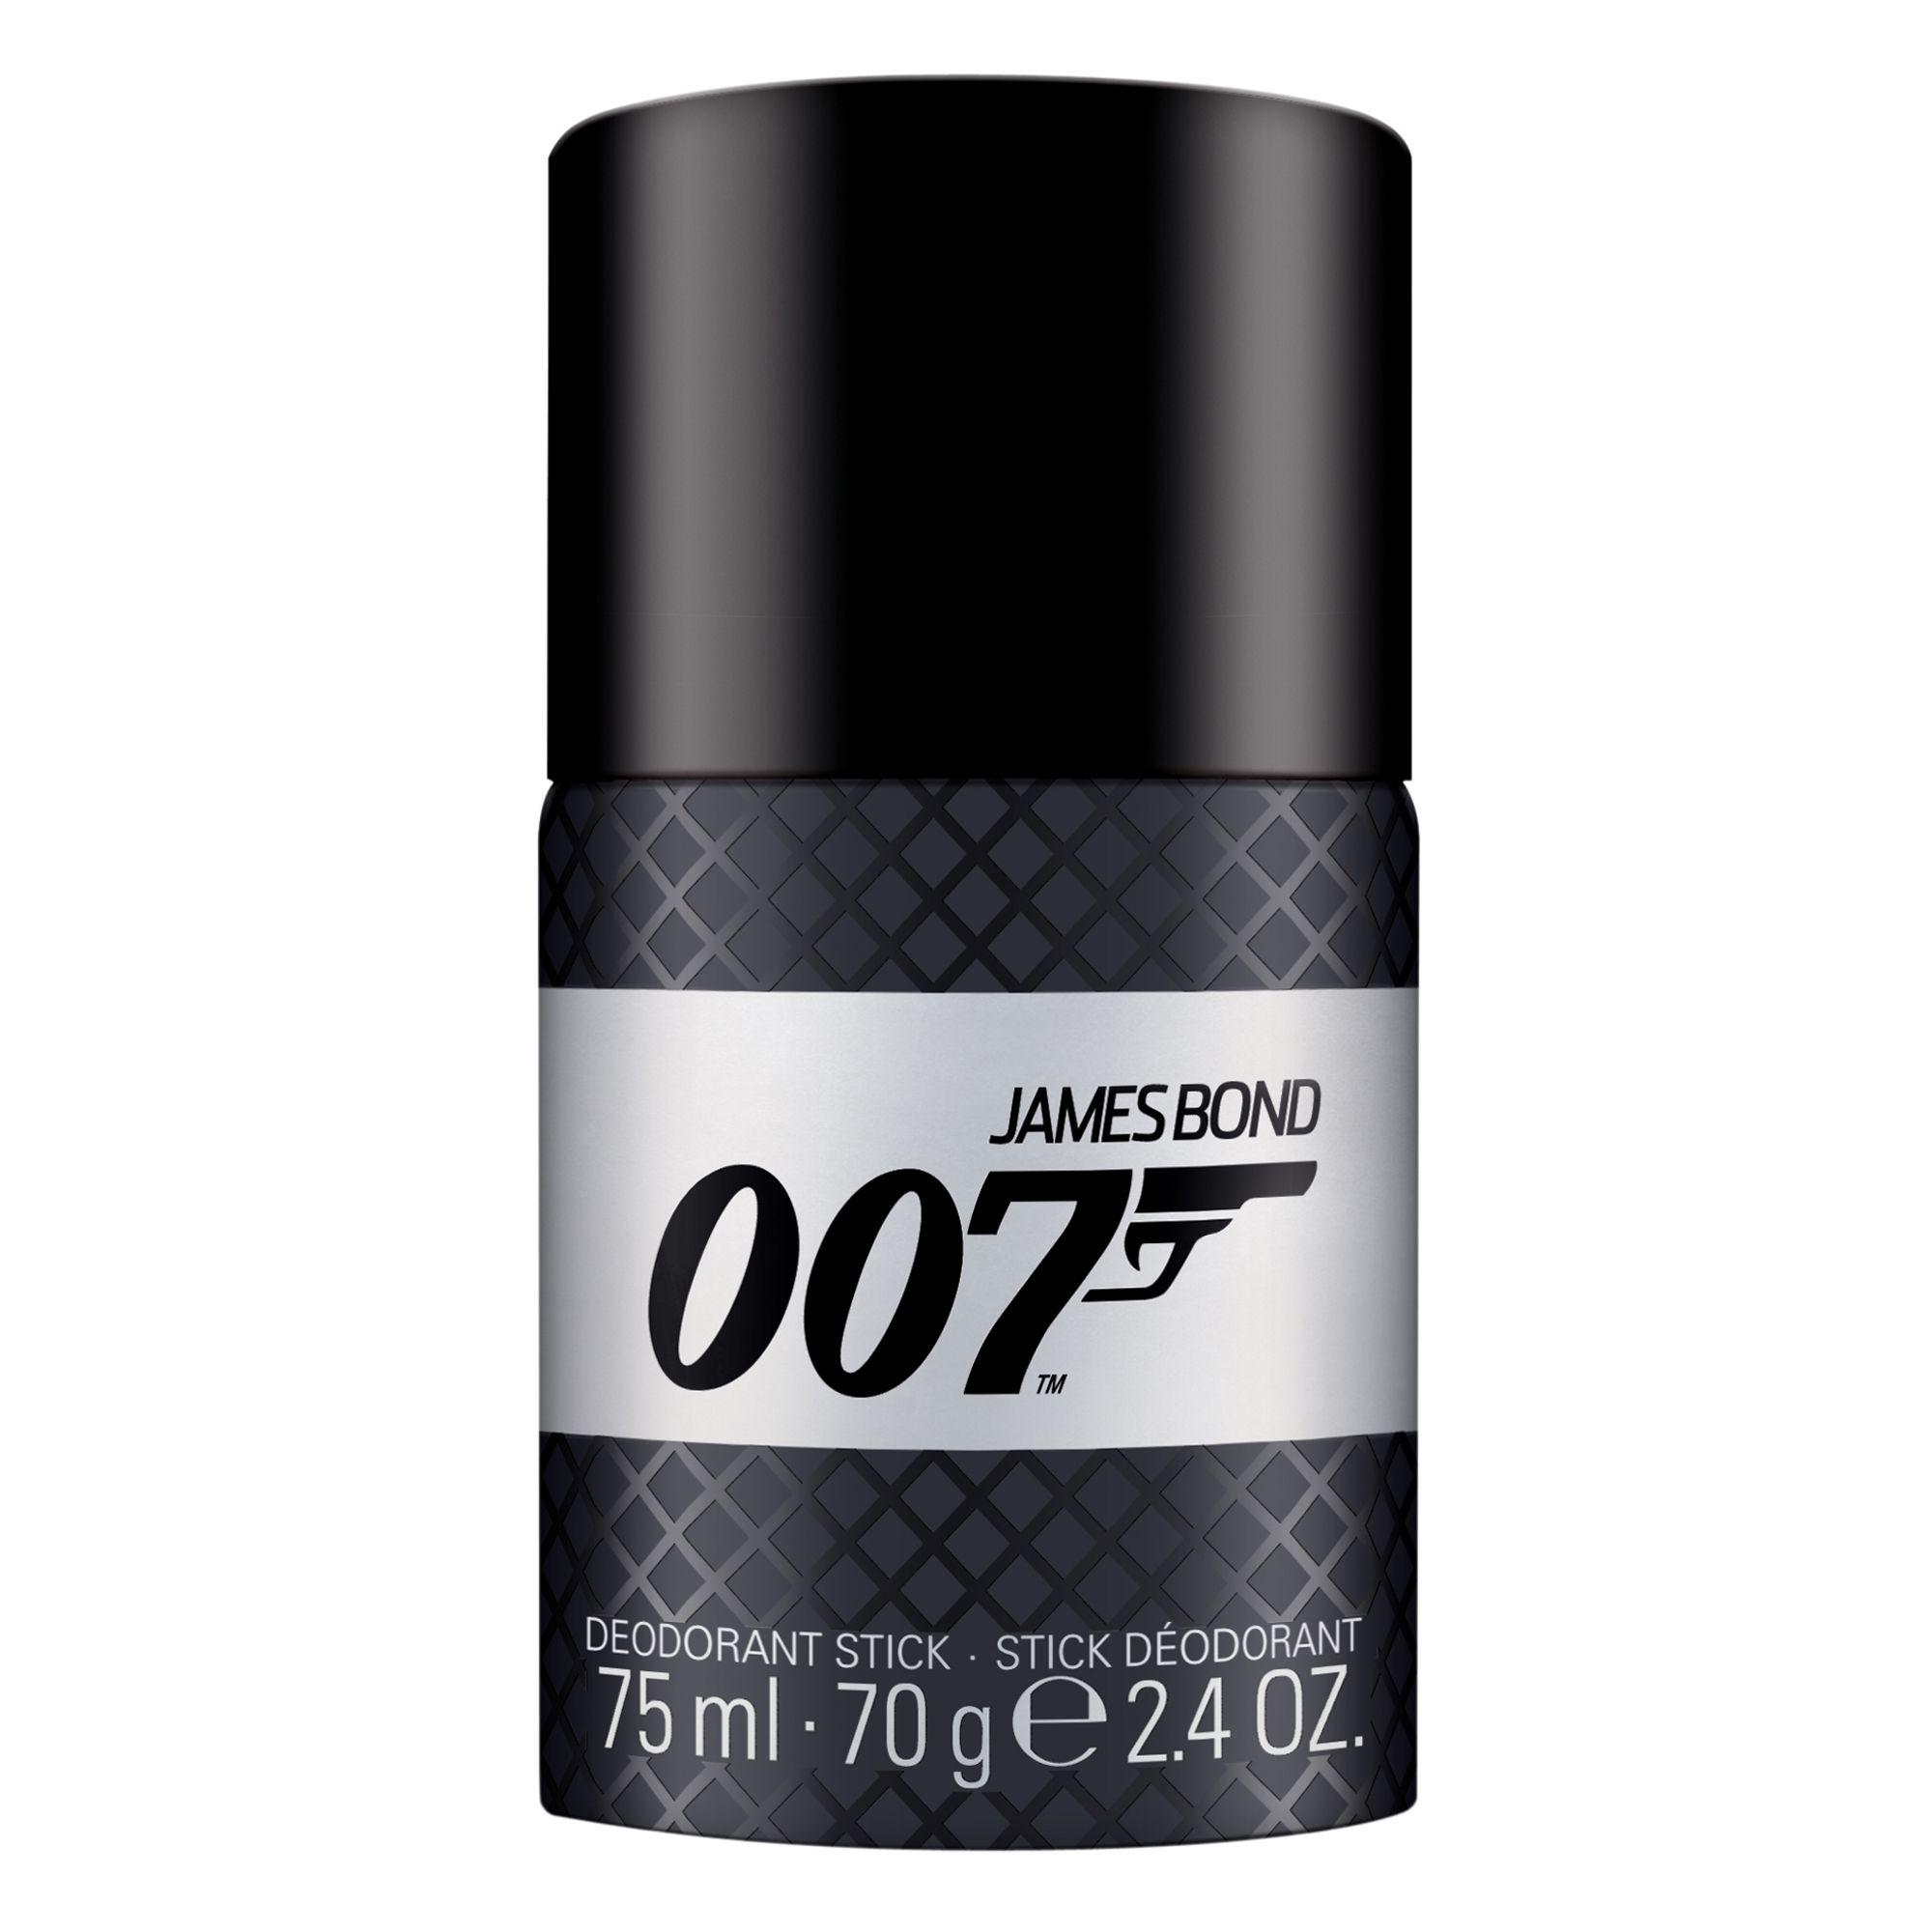 James Bond 007 Deostick 75 ml